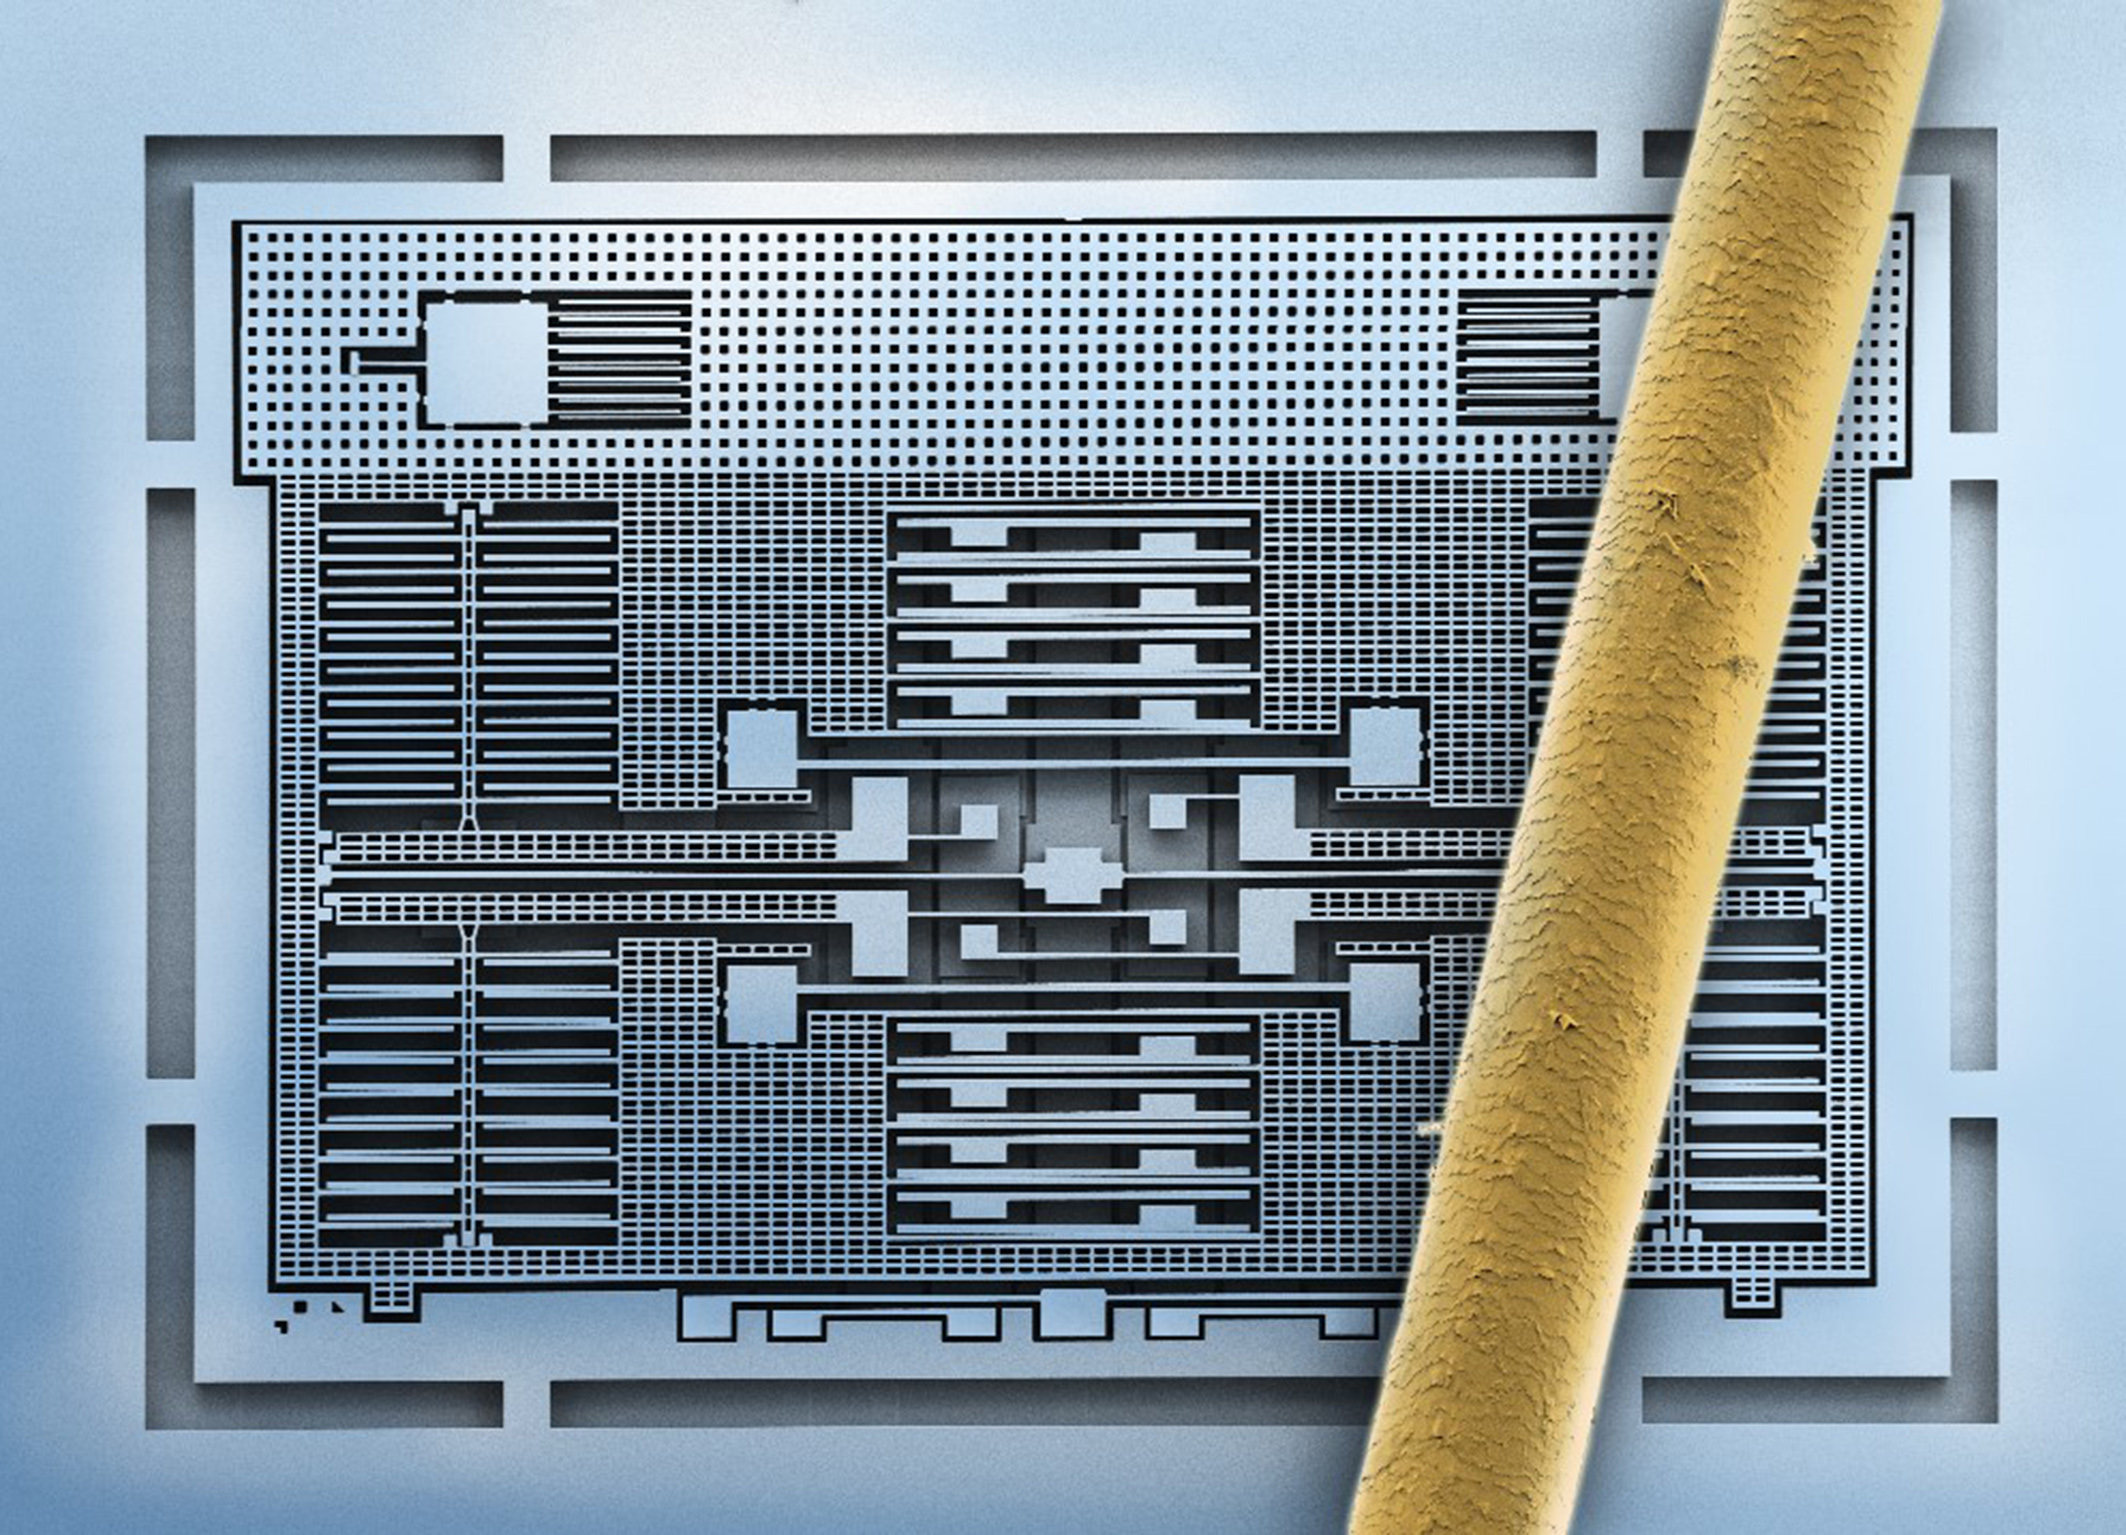 MEMS-Sensoren als Bausteine der vernetzten Welt